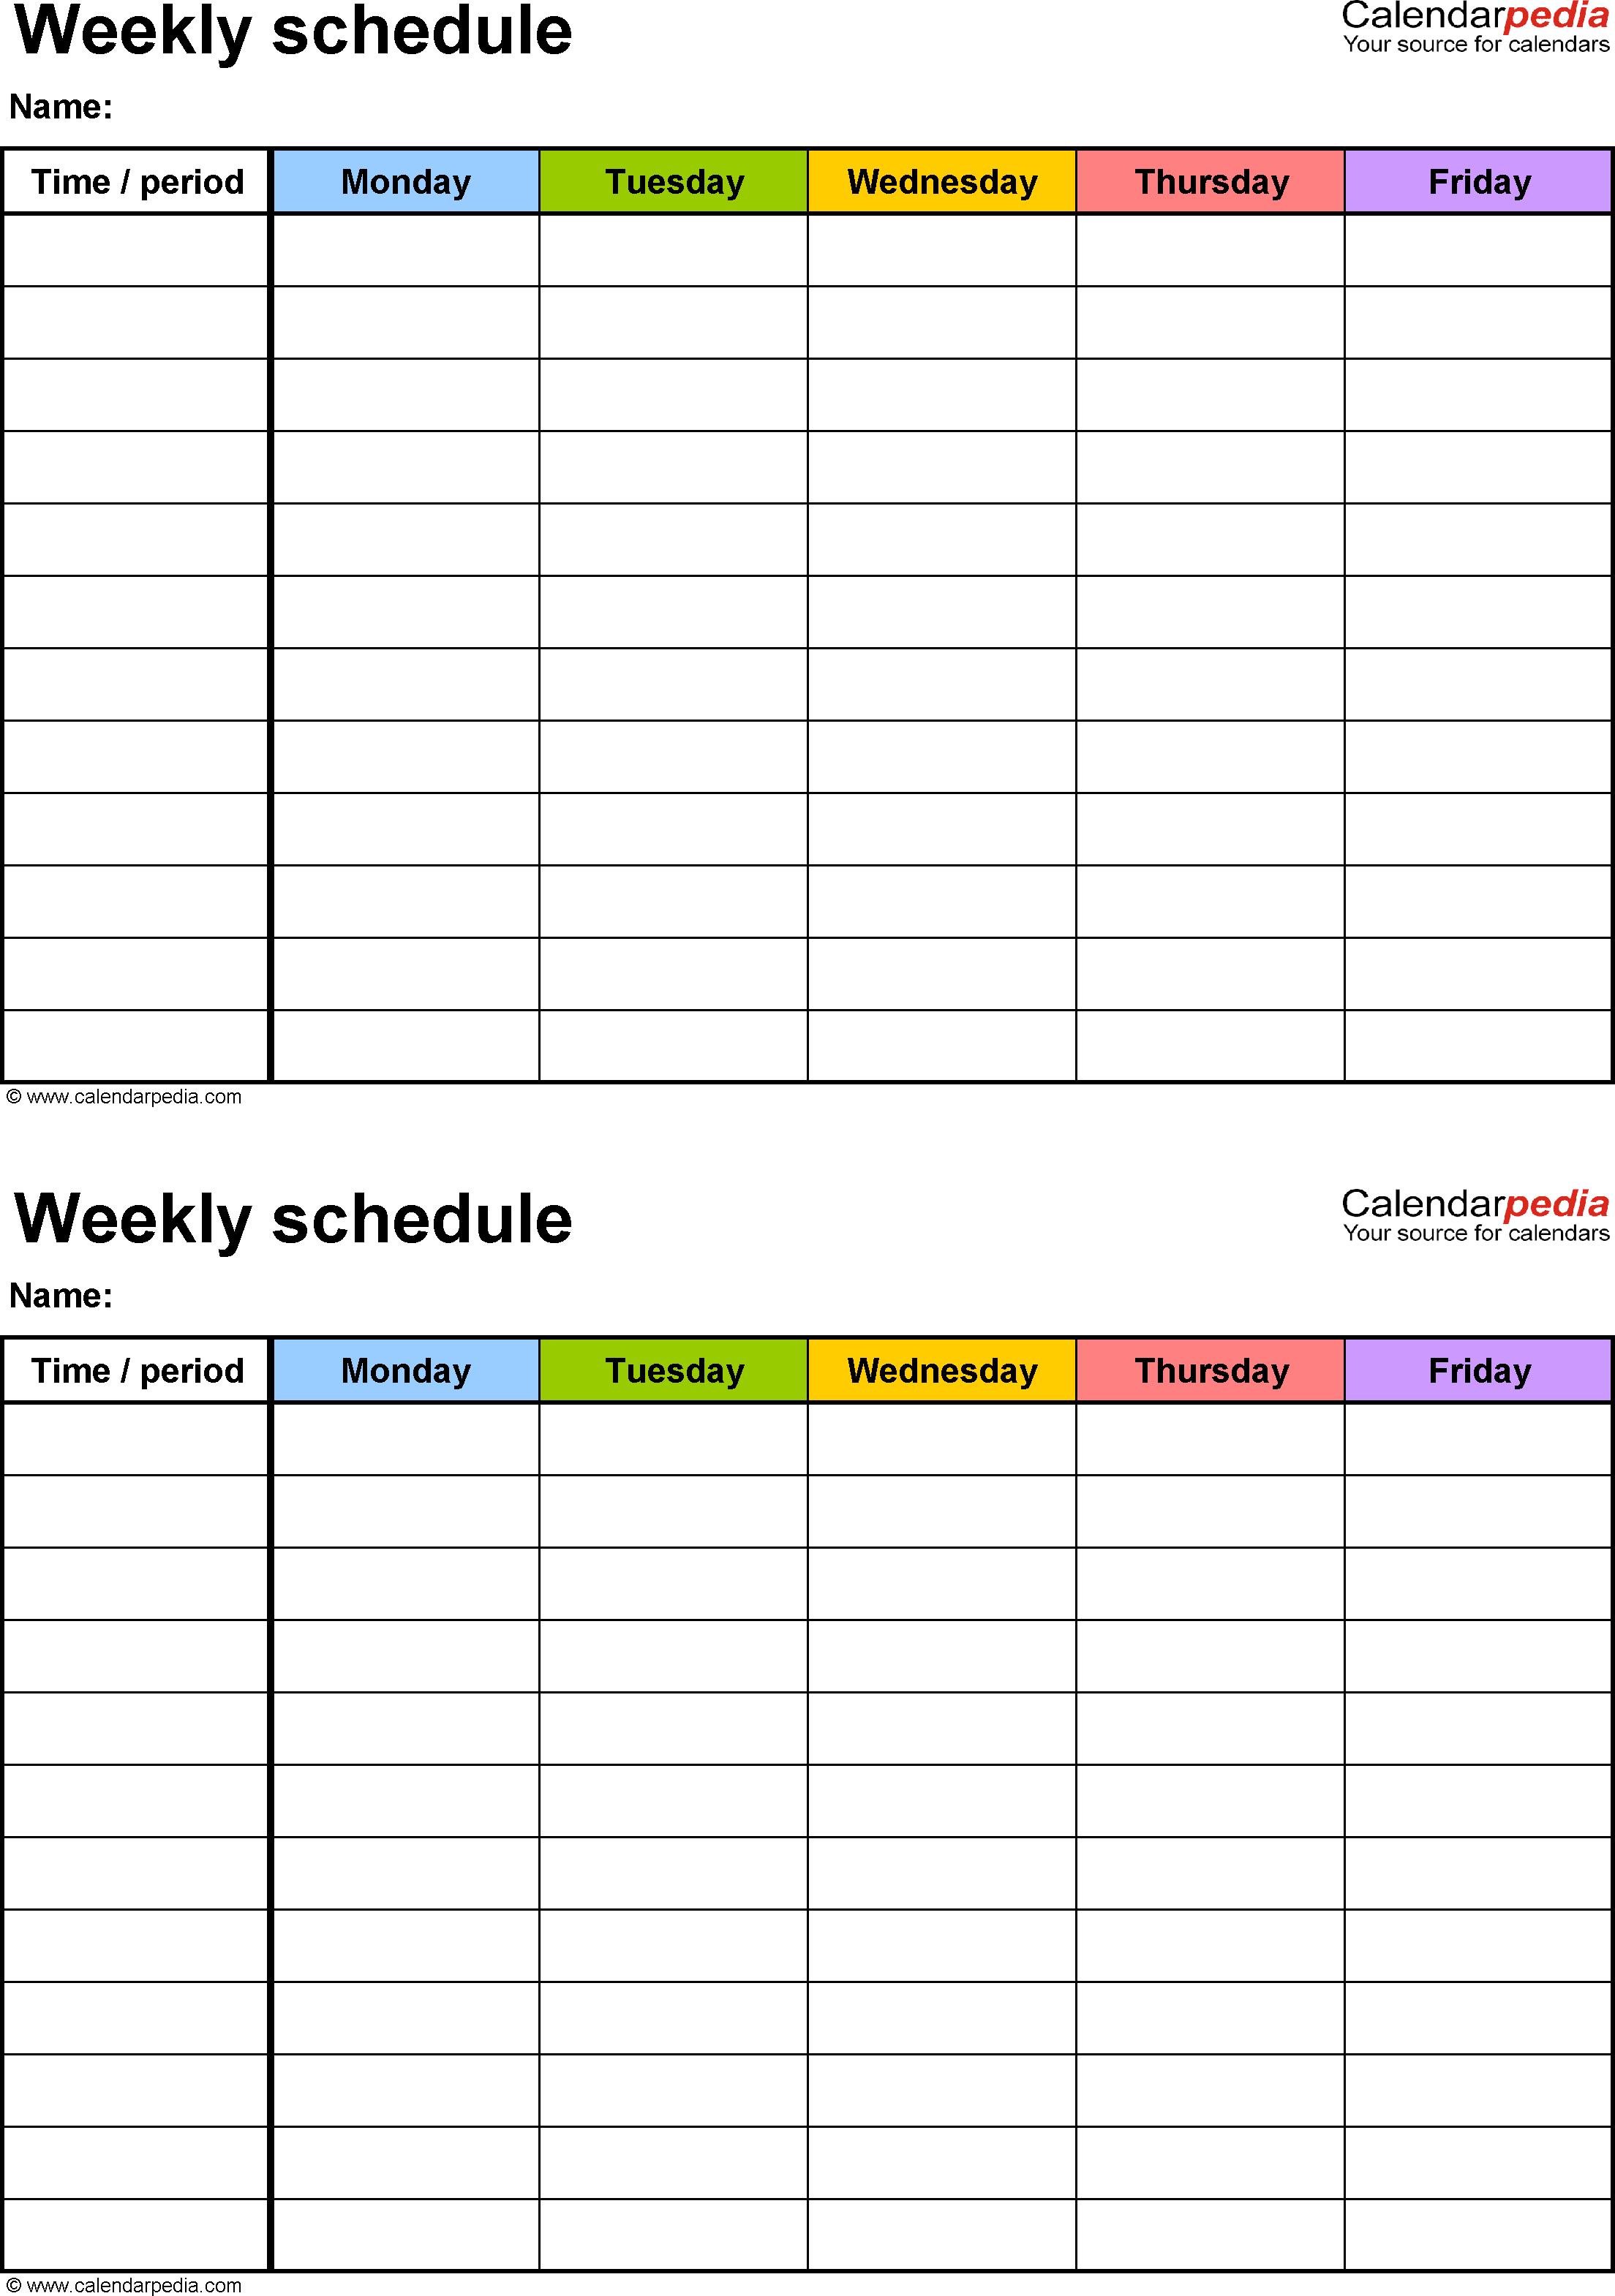 Summer Schedule Template - Colona.rsd7